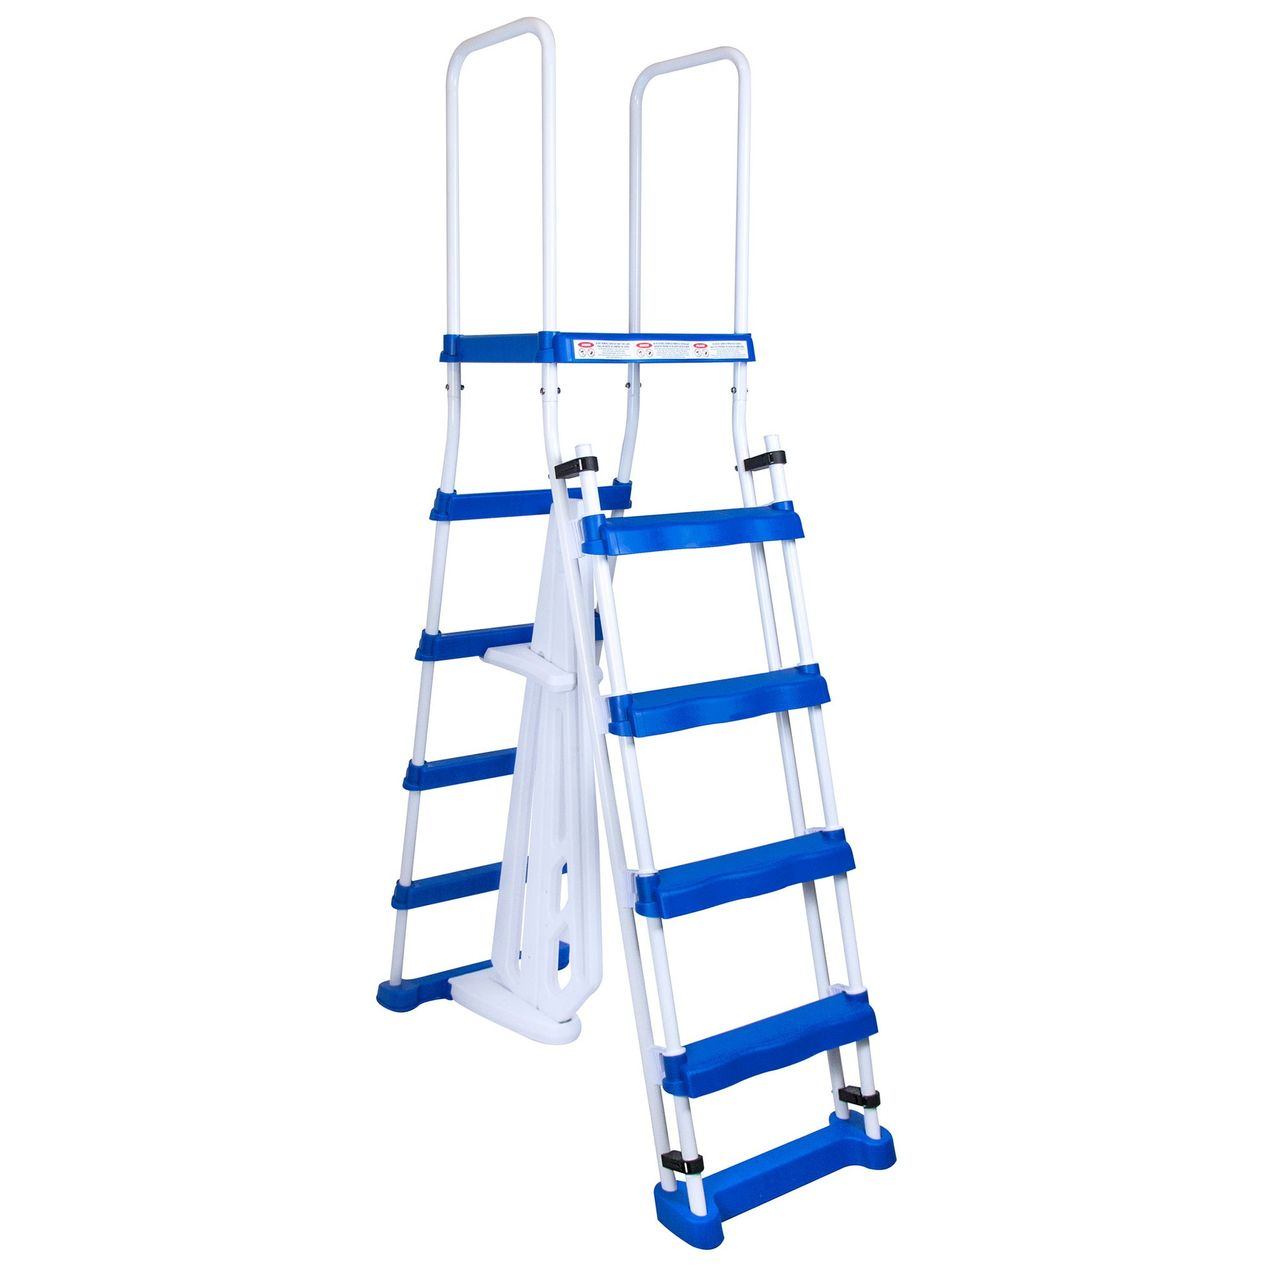 Swimline 87950/87952L Above Ground Pool Entry Ladder